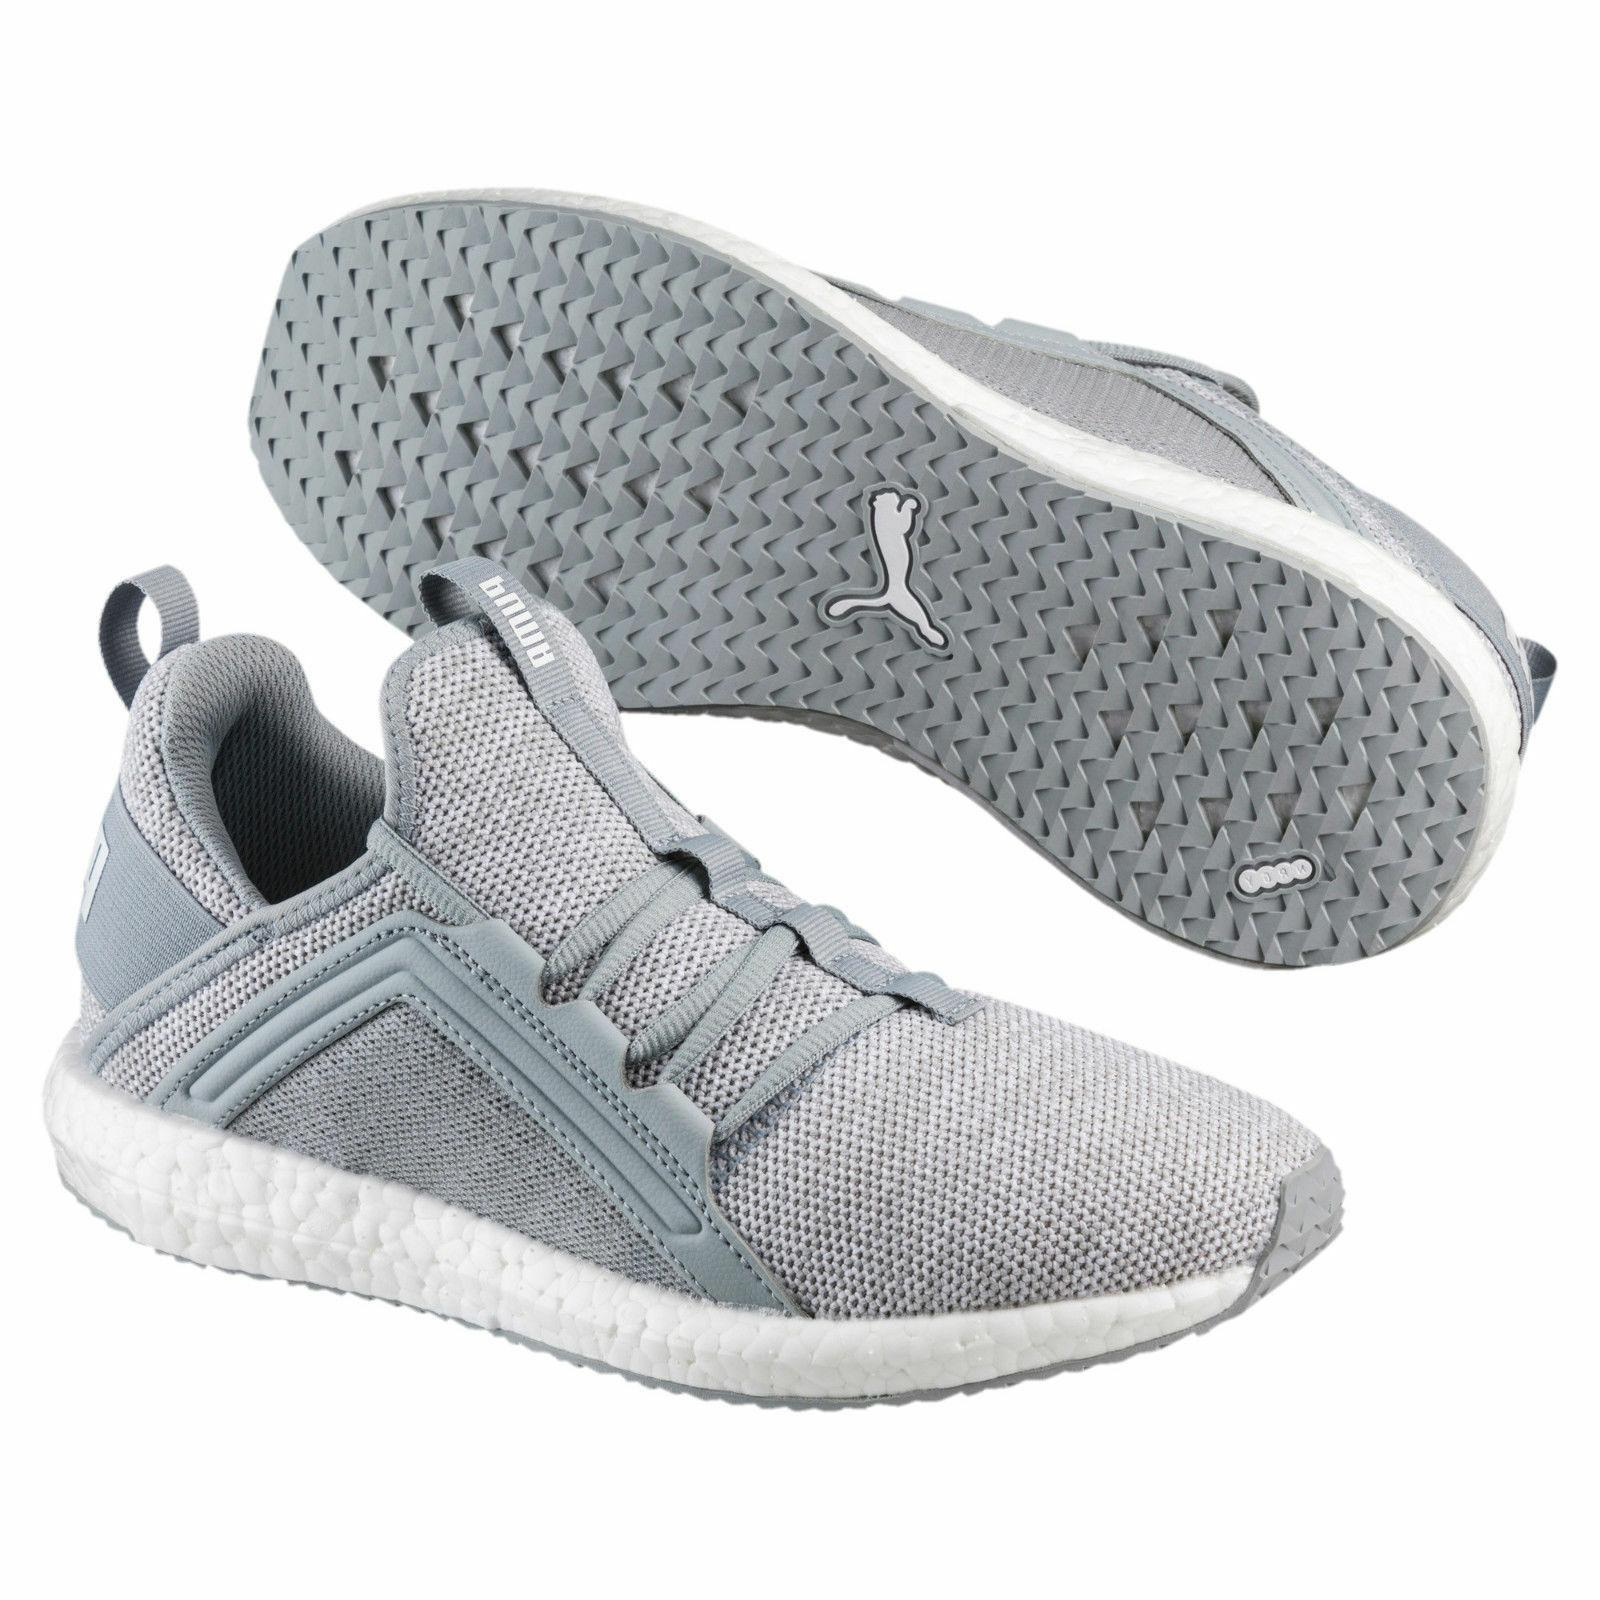 women s mega nrgy shoes running sneakers